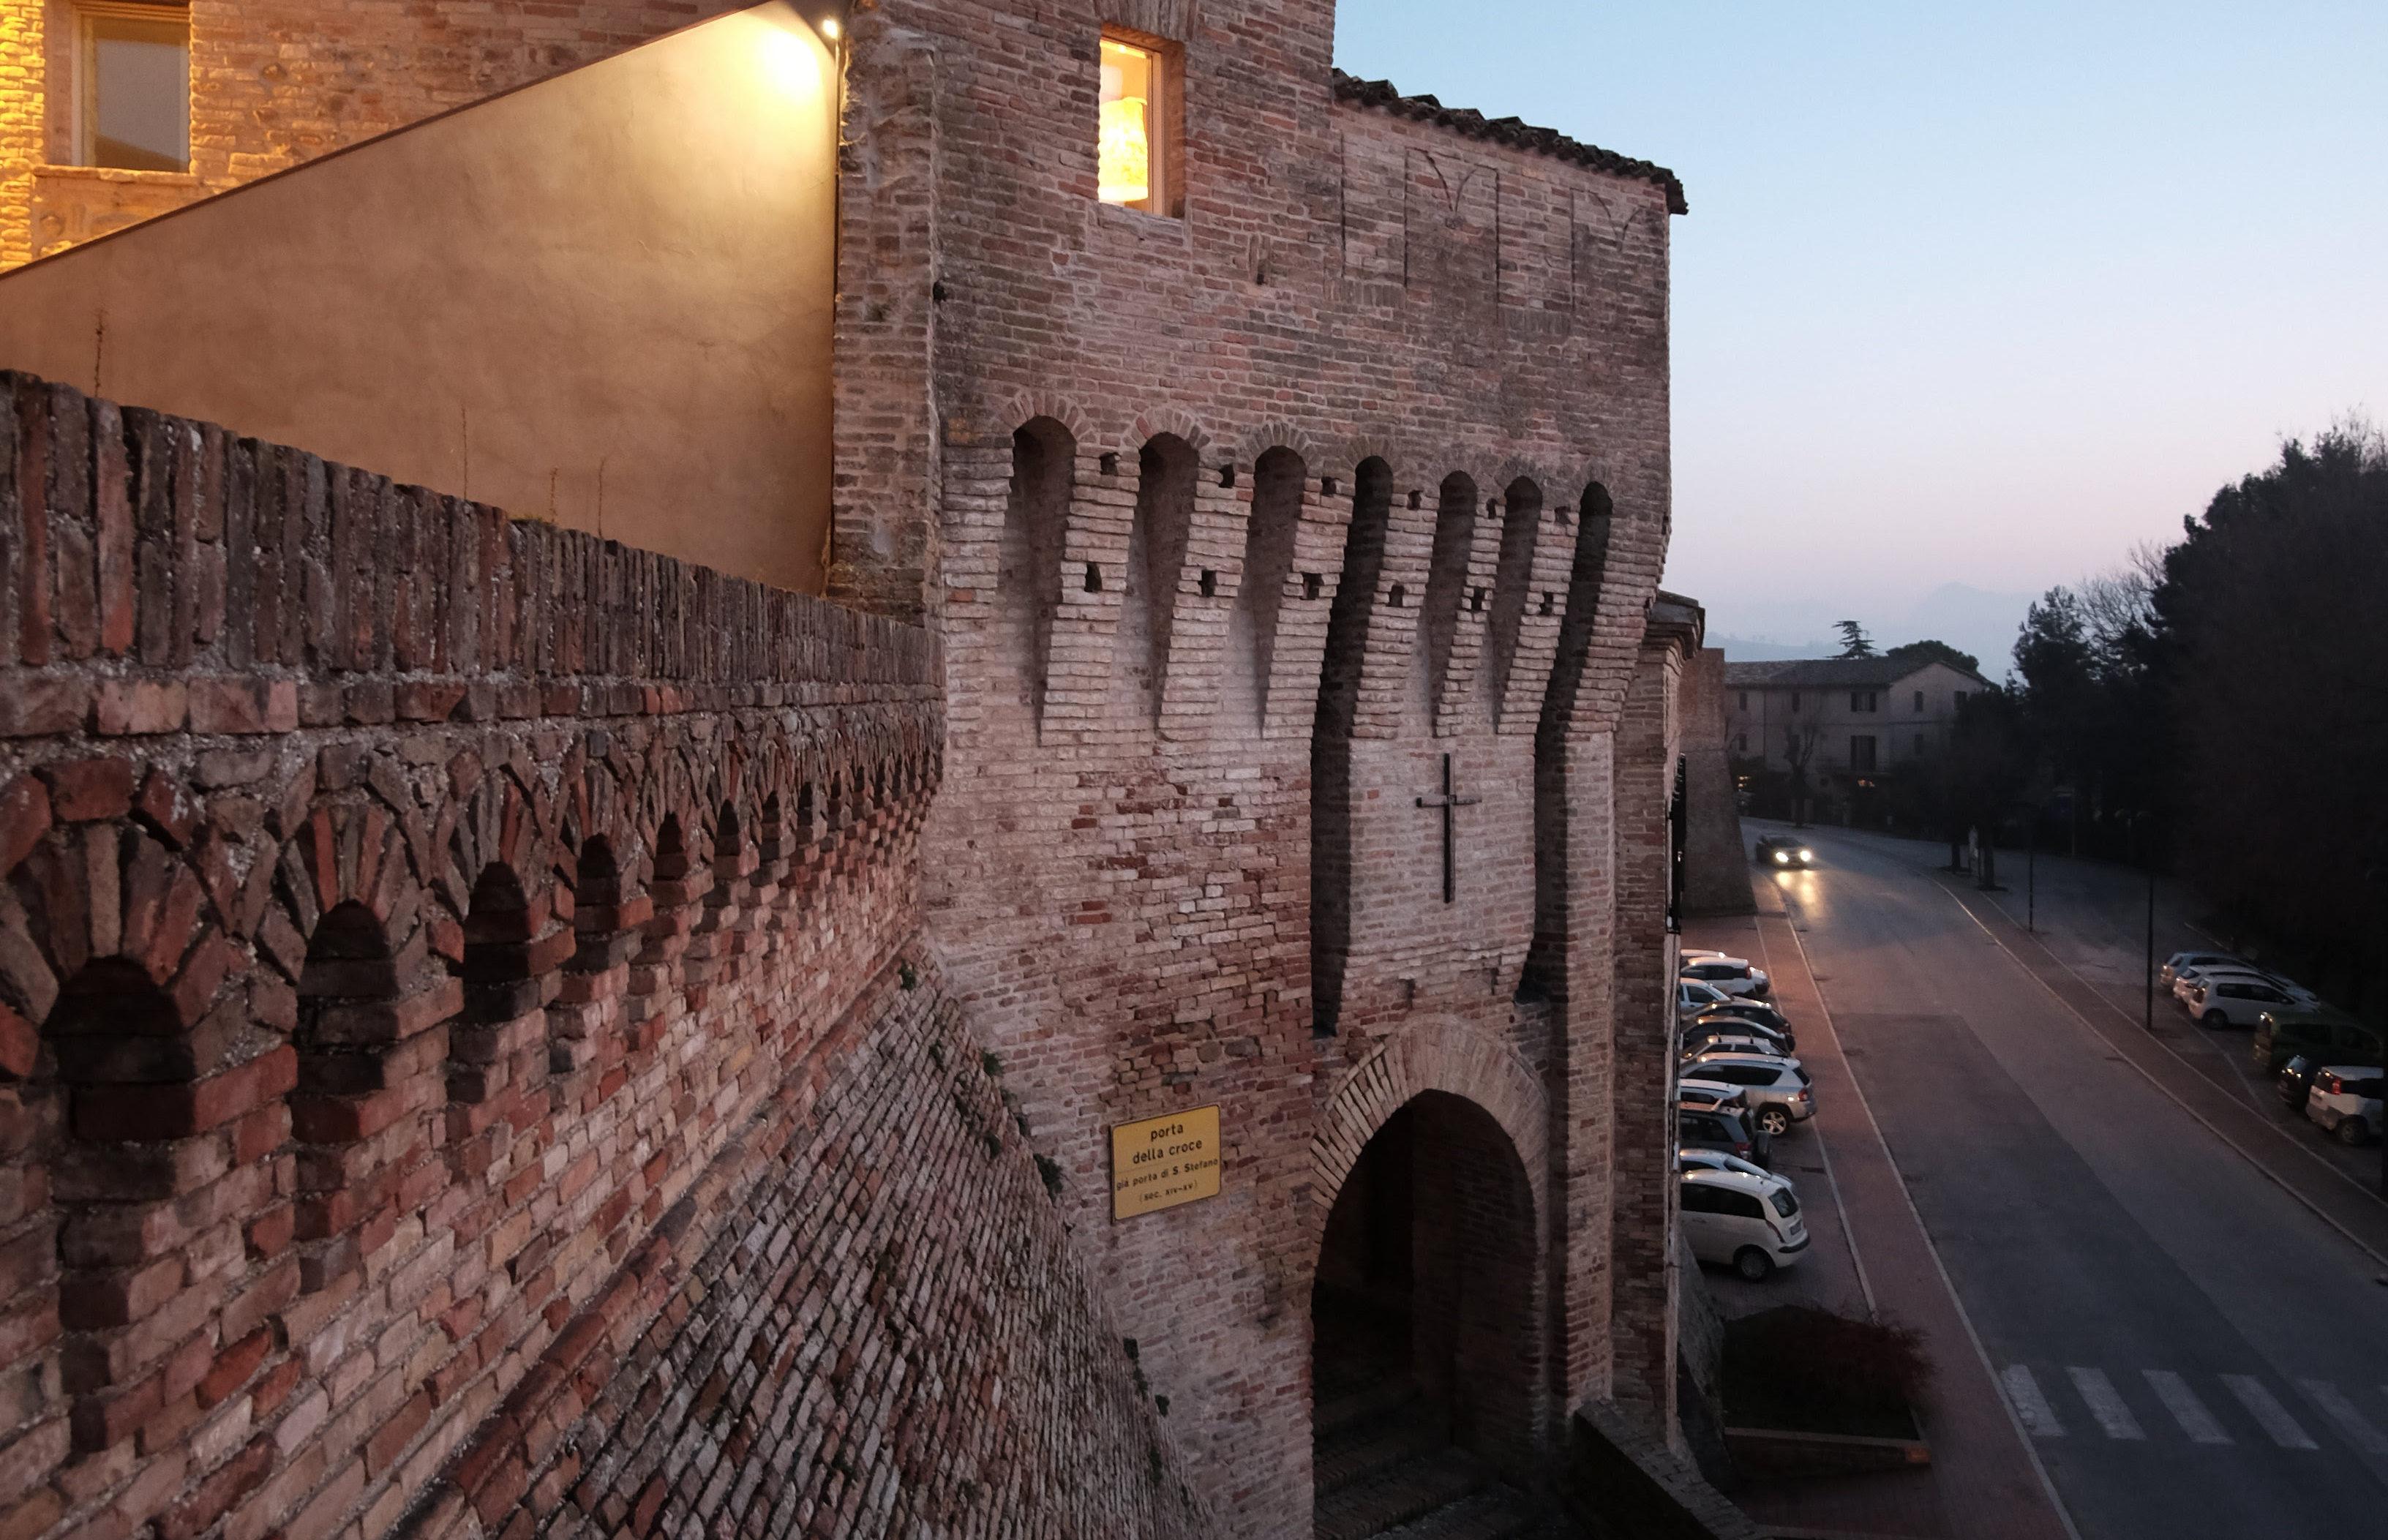 Un tesoro di Serra de' Conti risplende grazie a Matteo Avaltroni